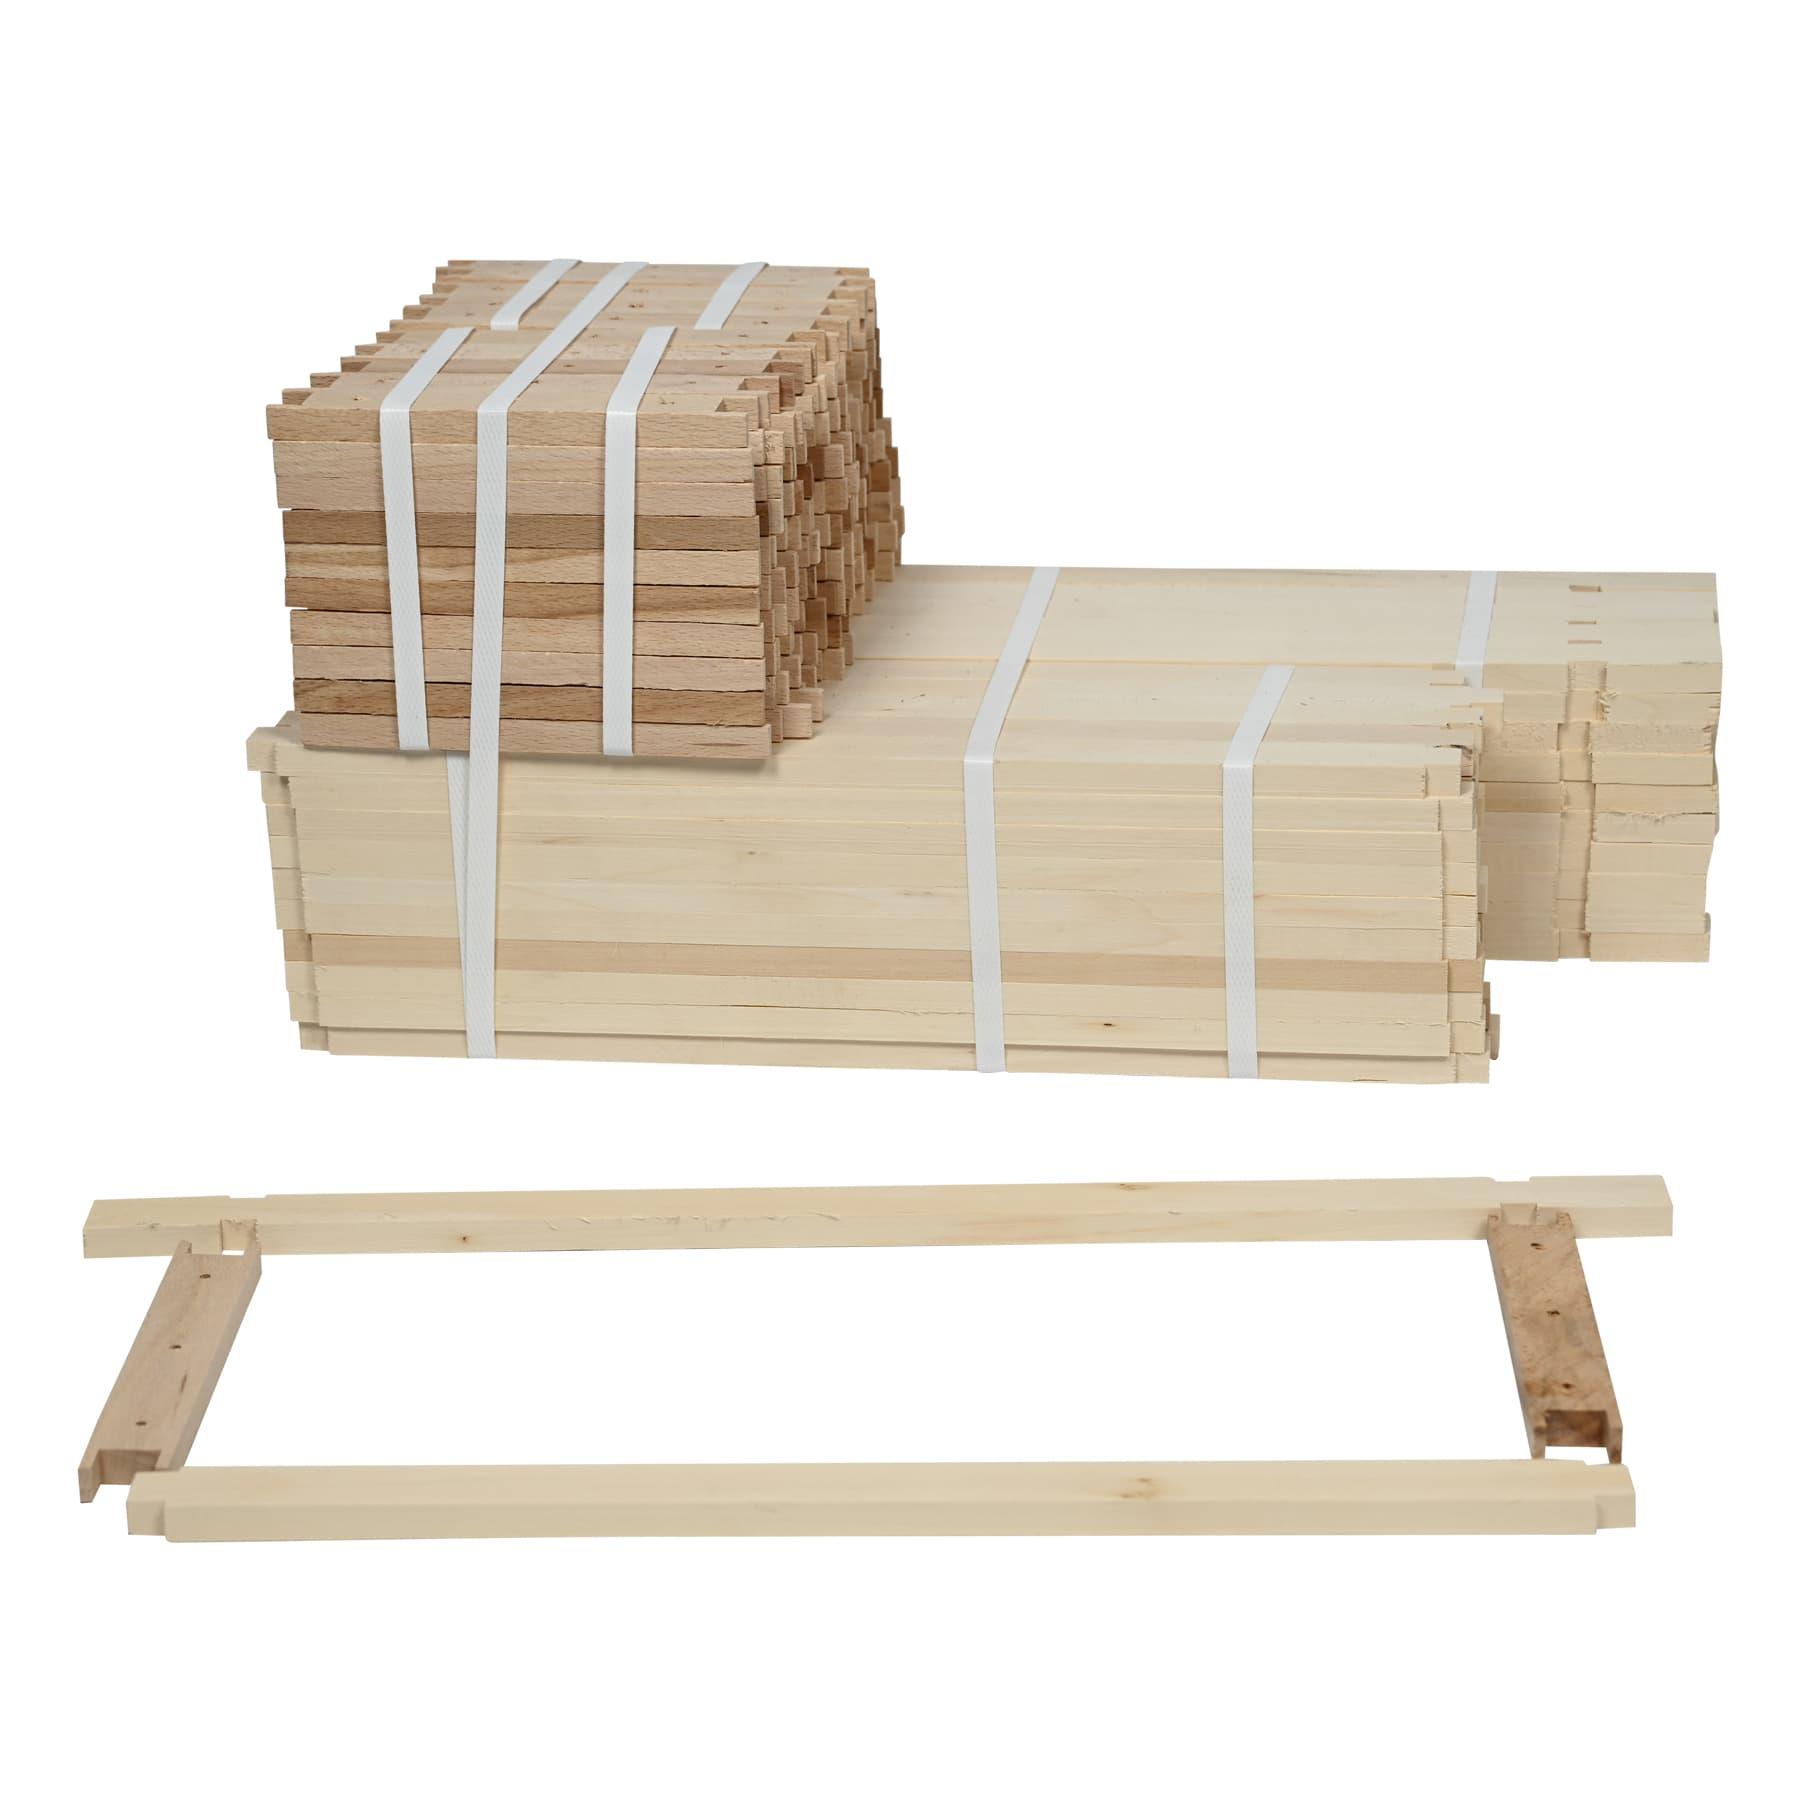 Rähmchen Simplex Honig  i. T. 436 x 140 mm